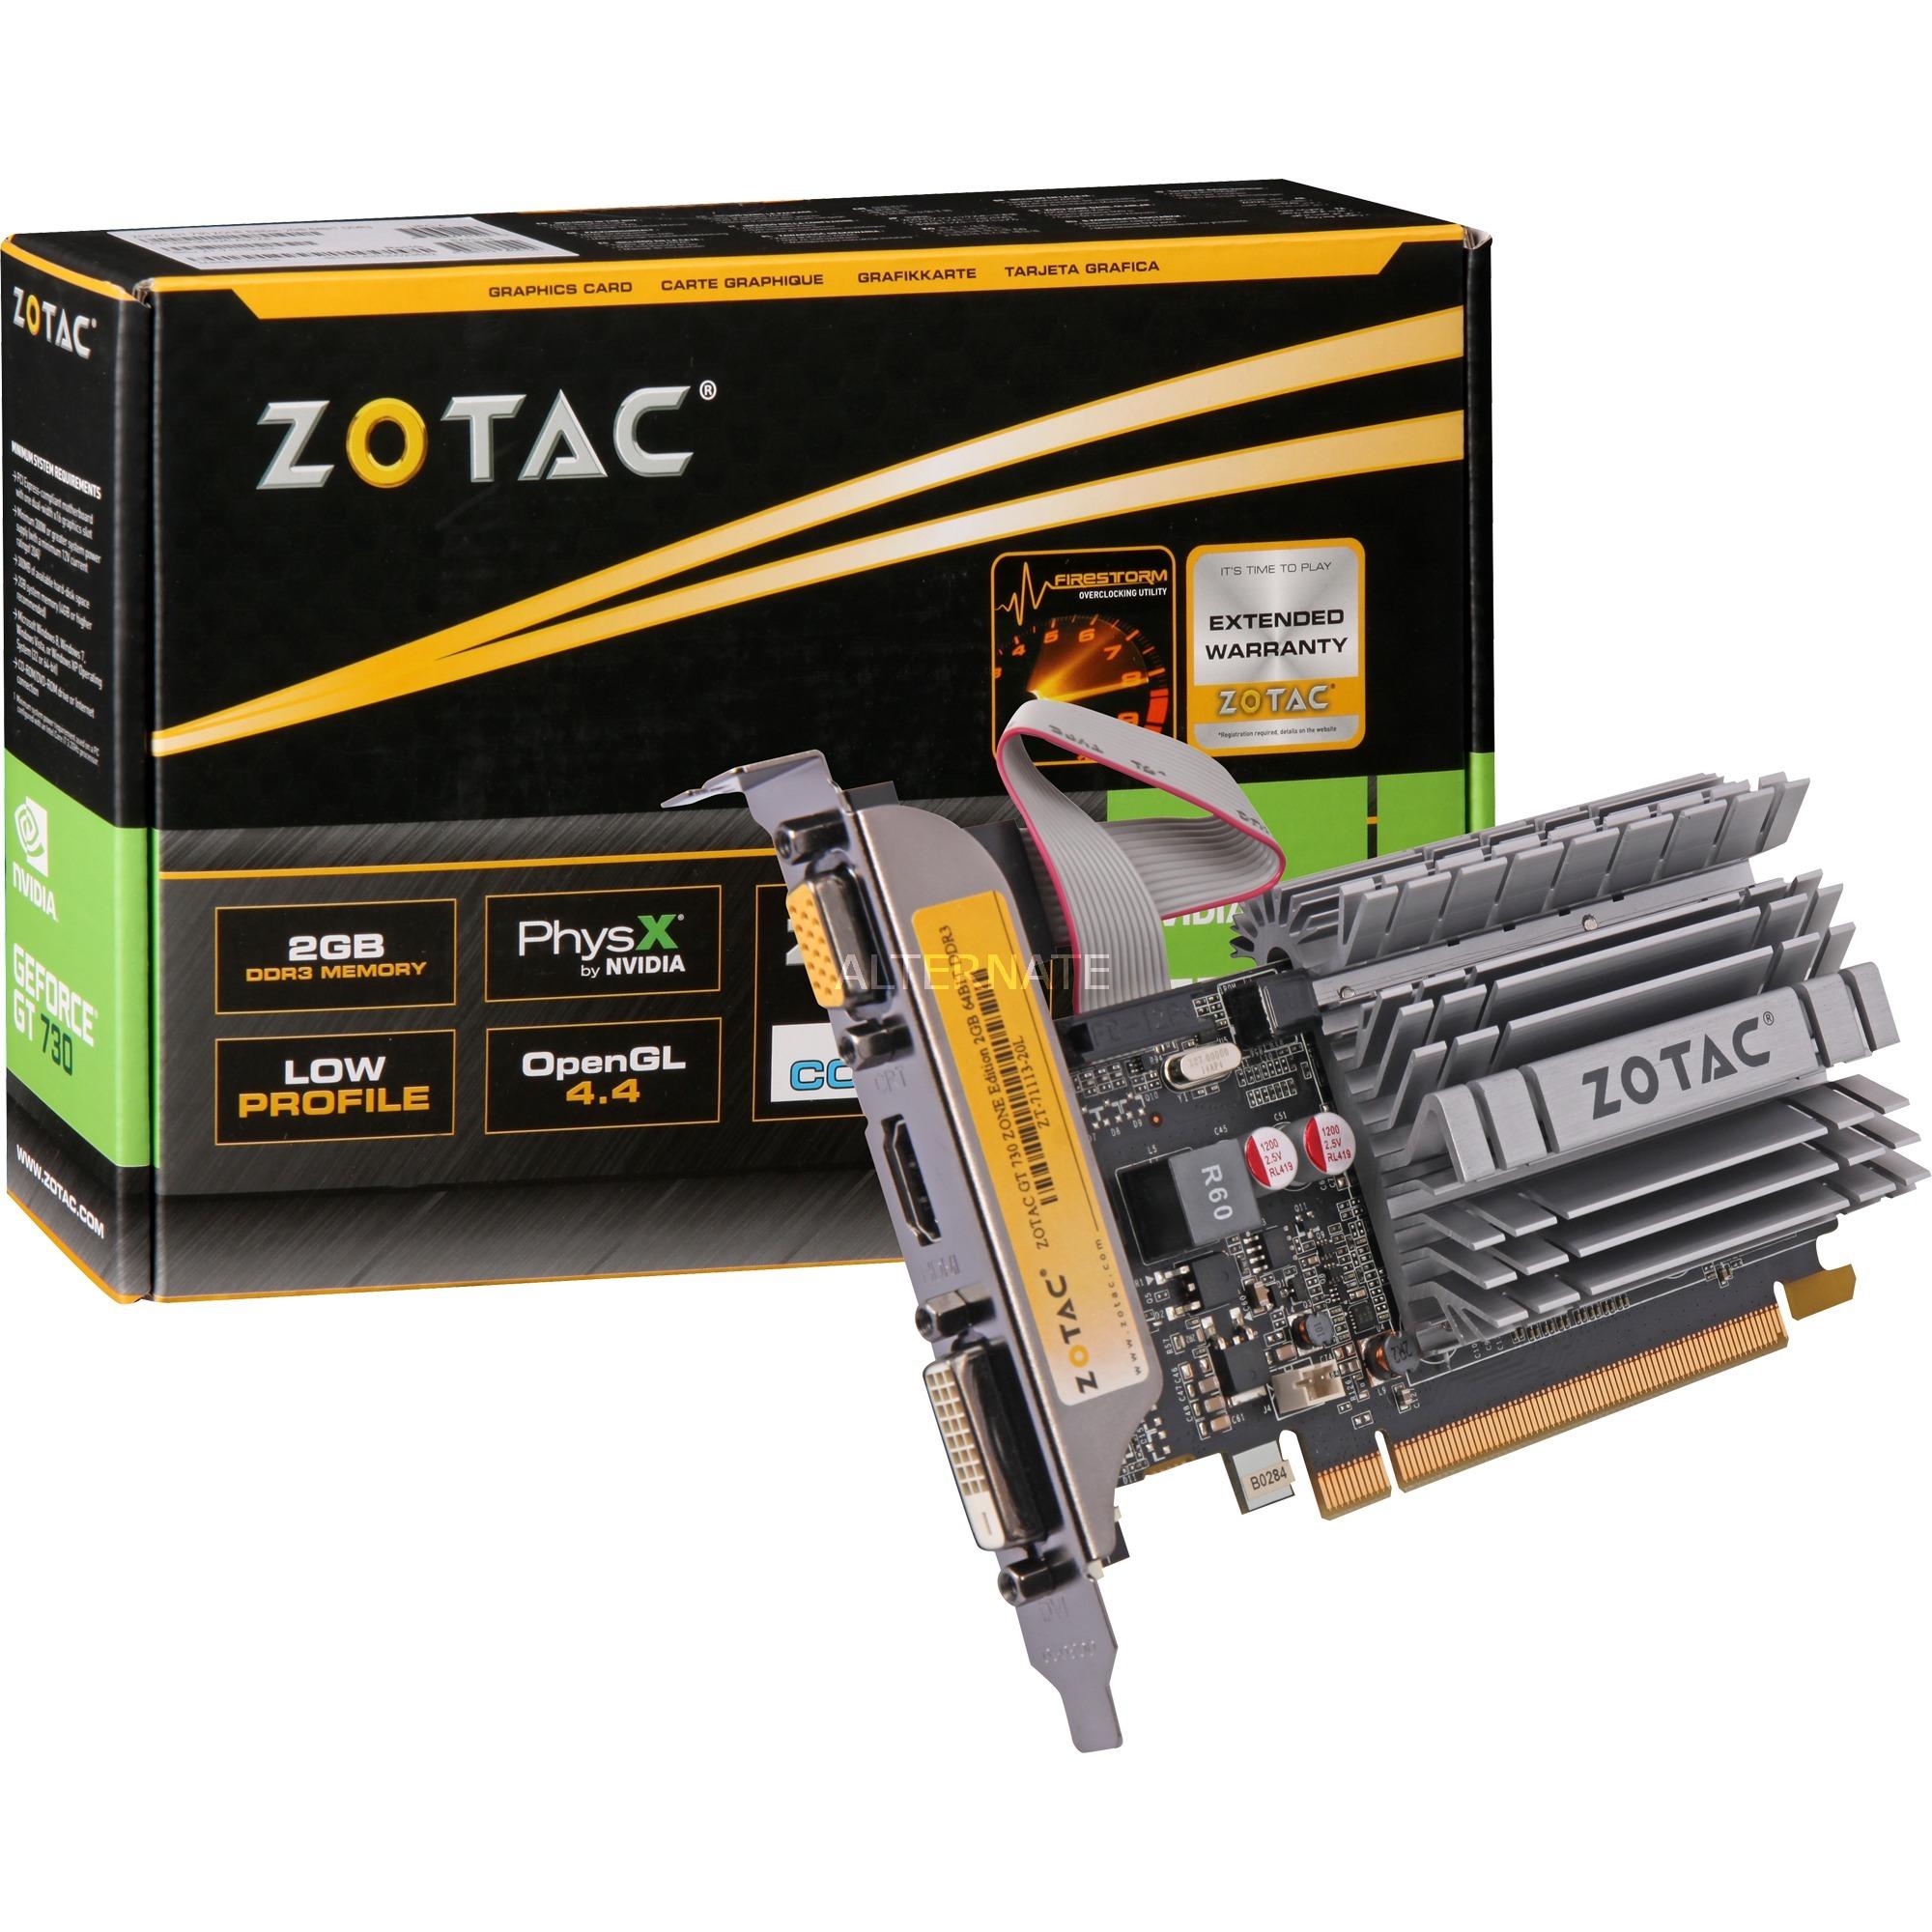 GeForce GT 730 2GB GDDR3, Tarjeta gráfica